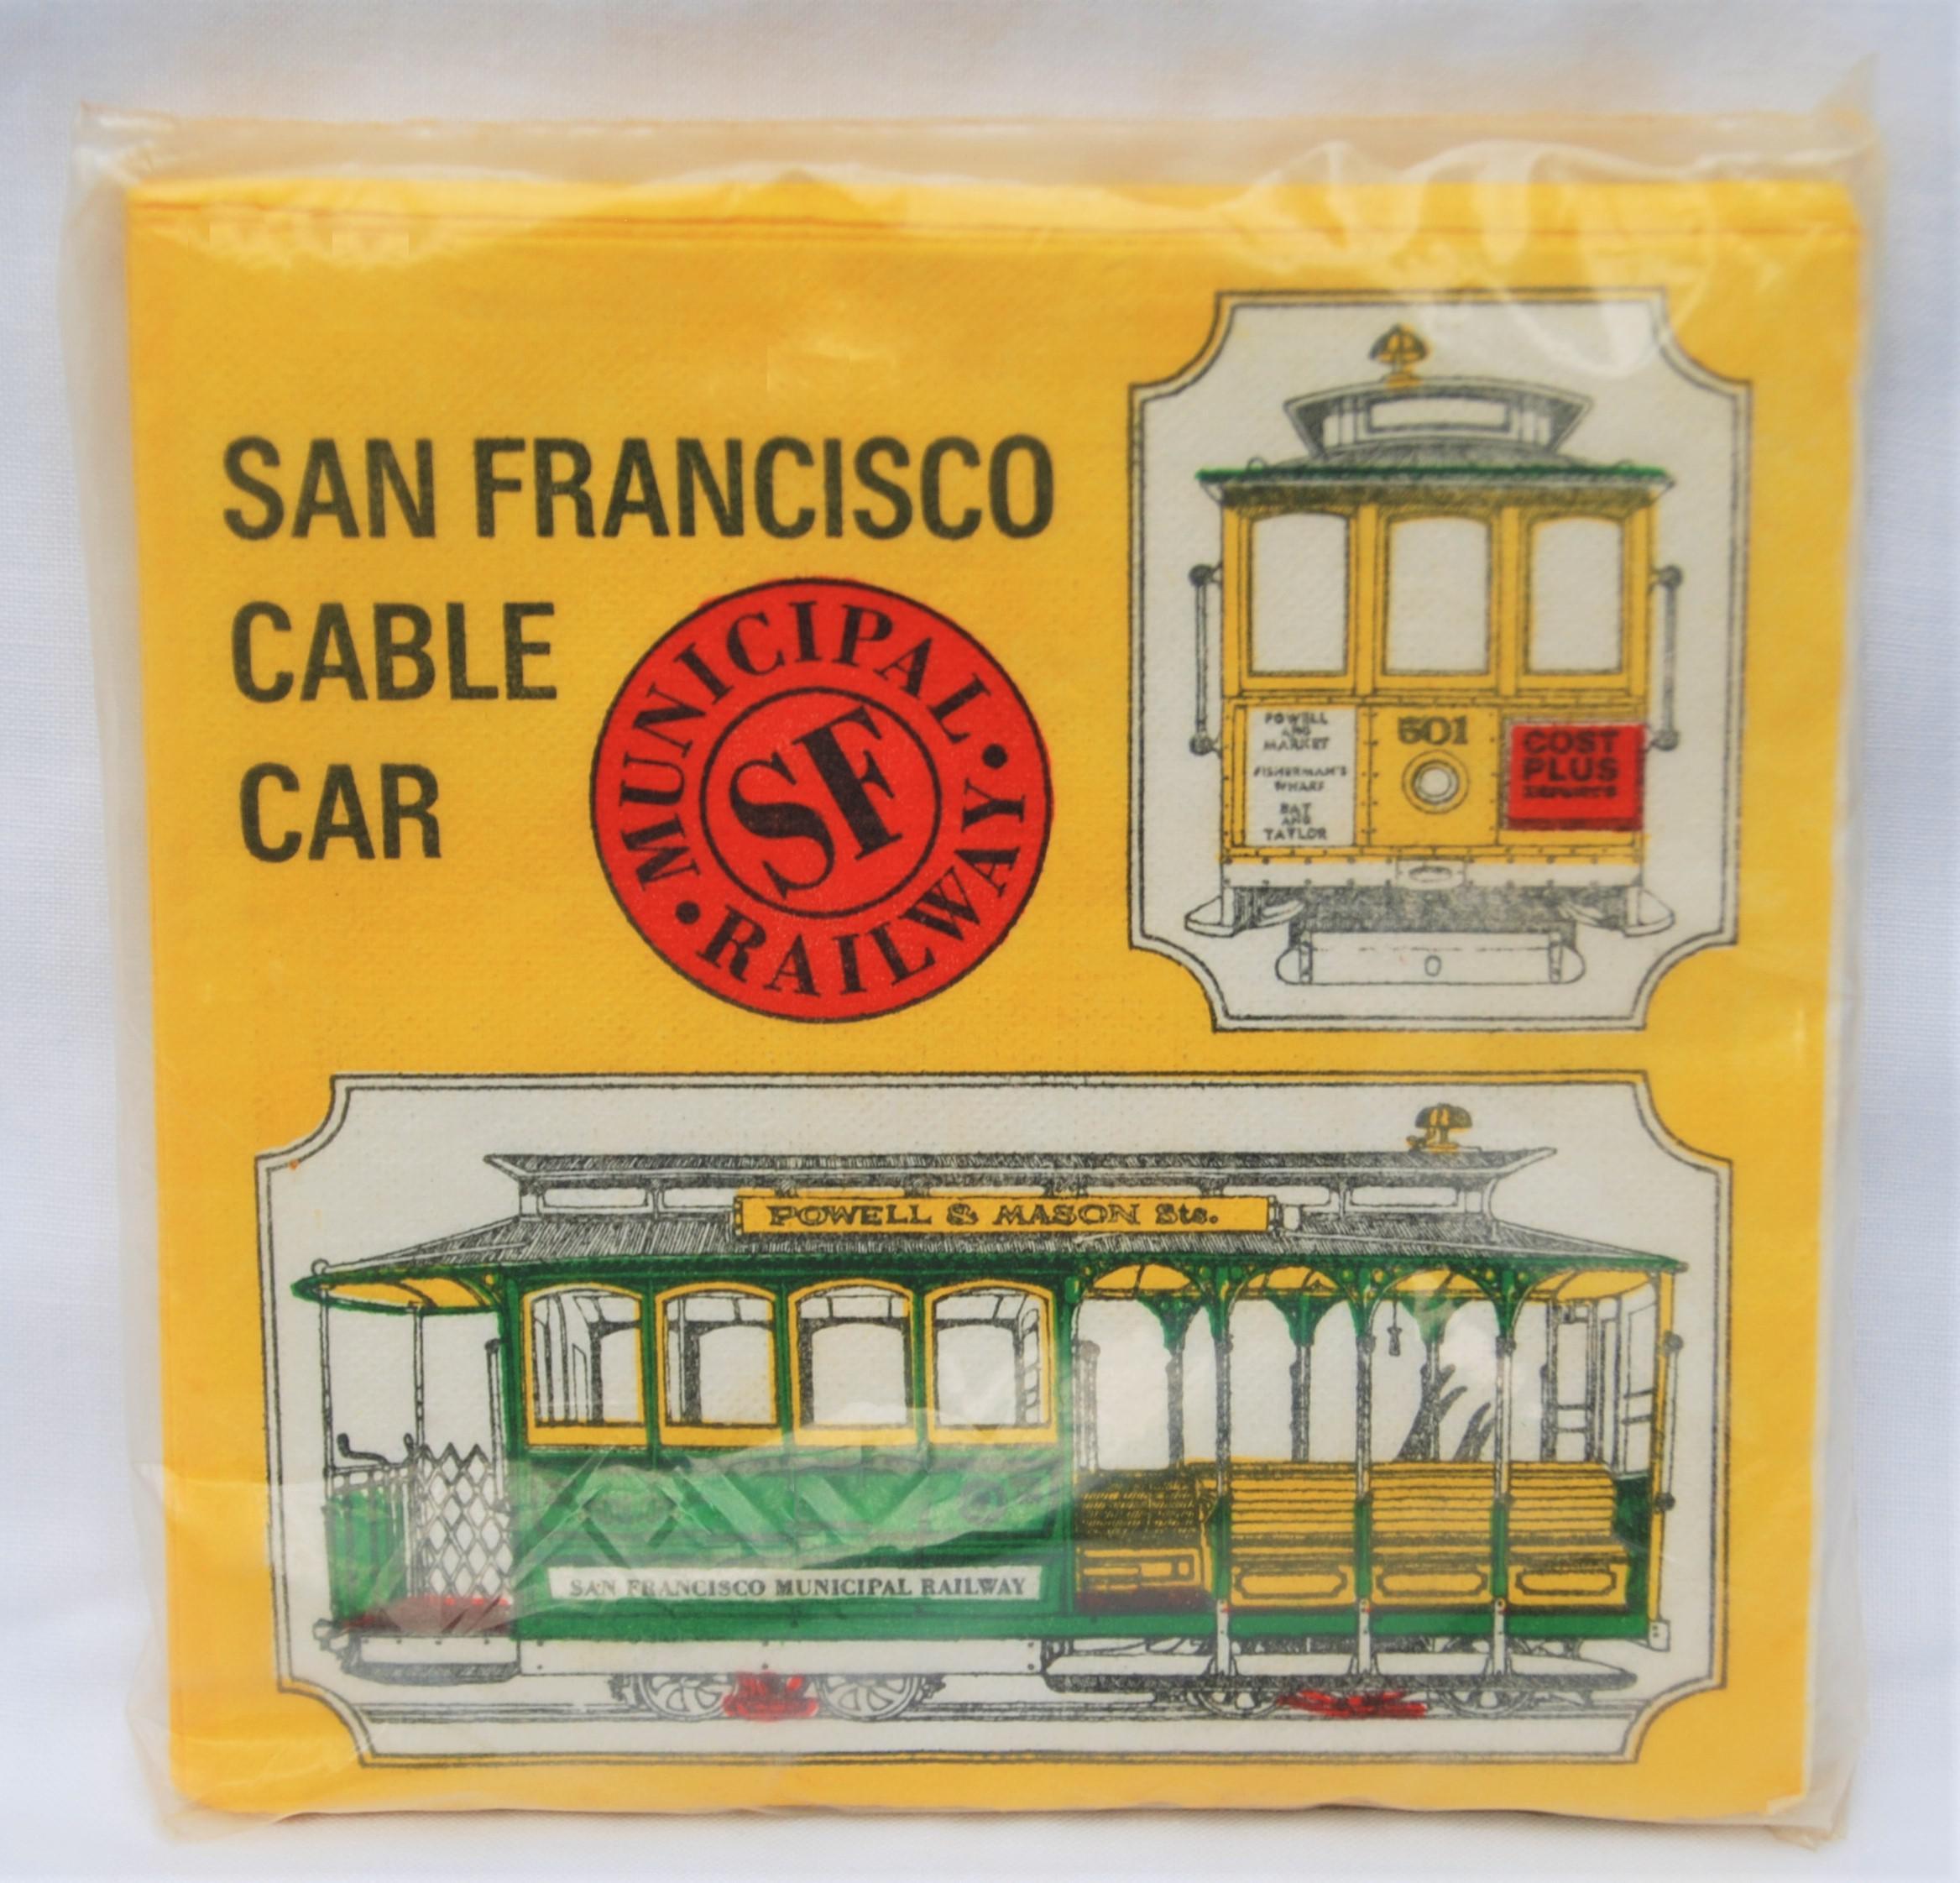 Vintage San Francisco Cable Car Paper Napkins   Set Of 24   Image 6 Of 6